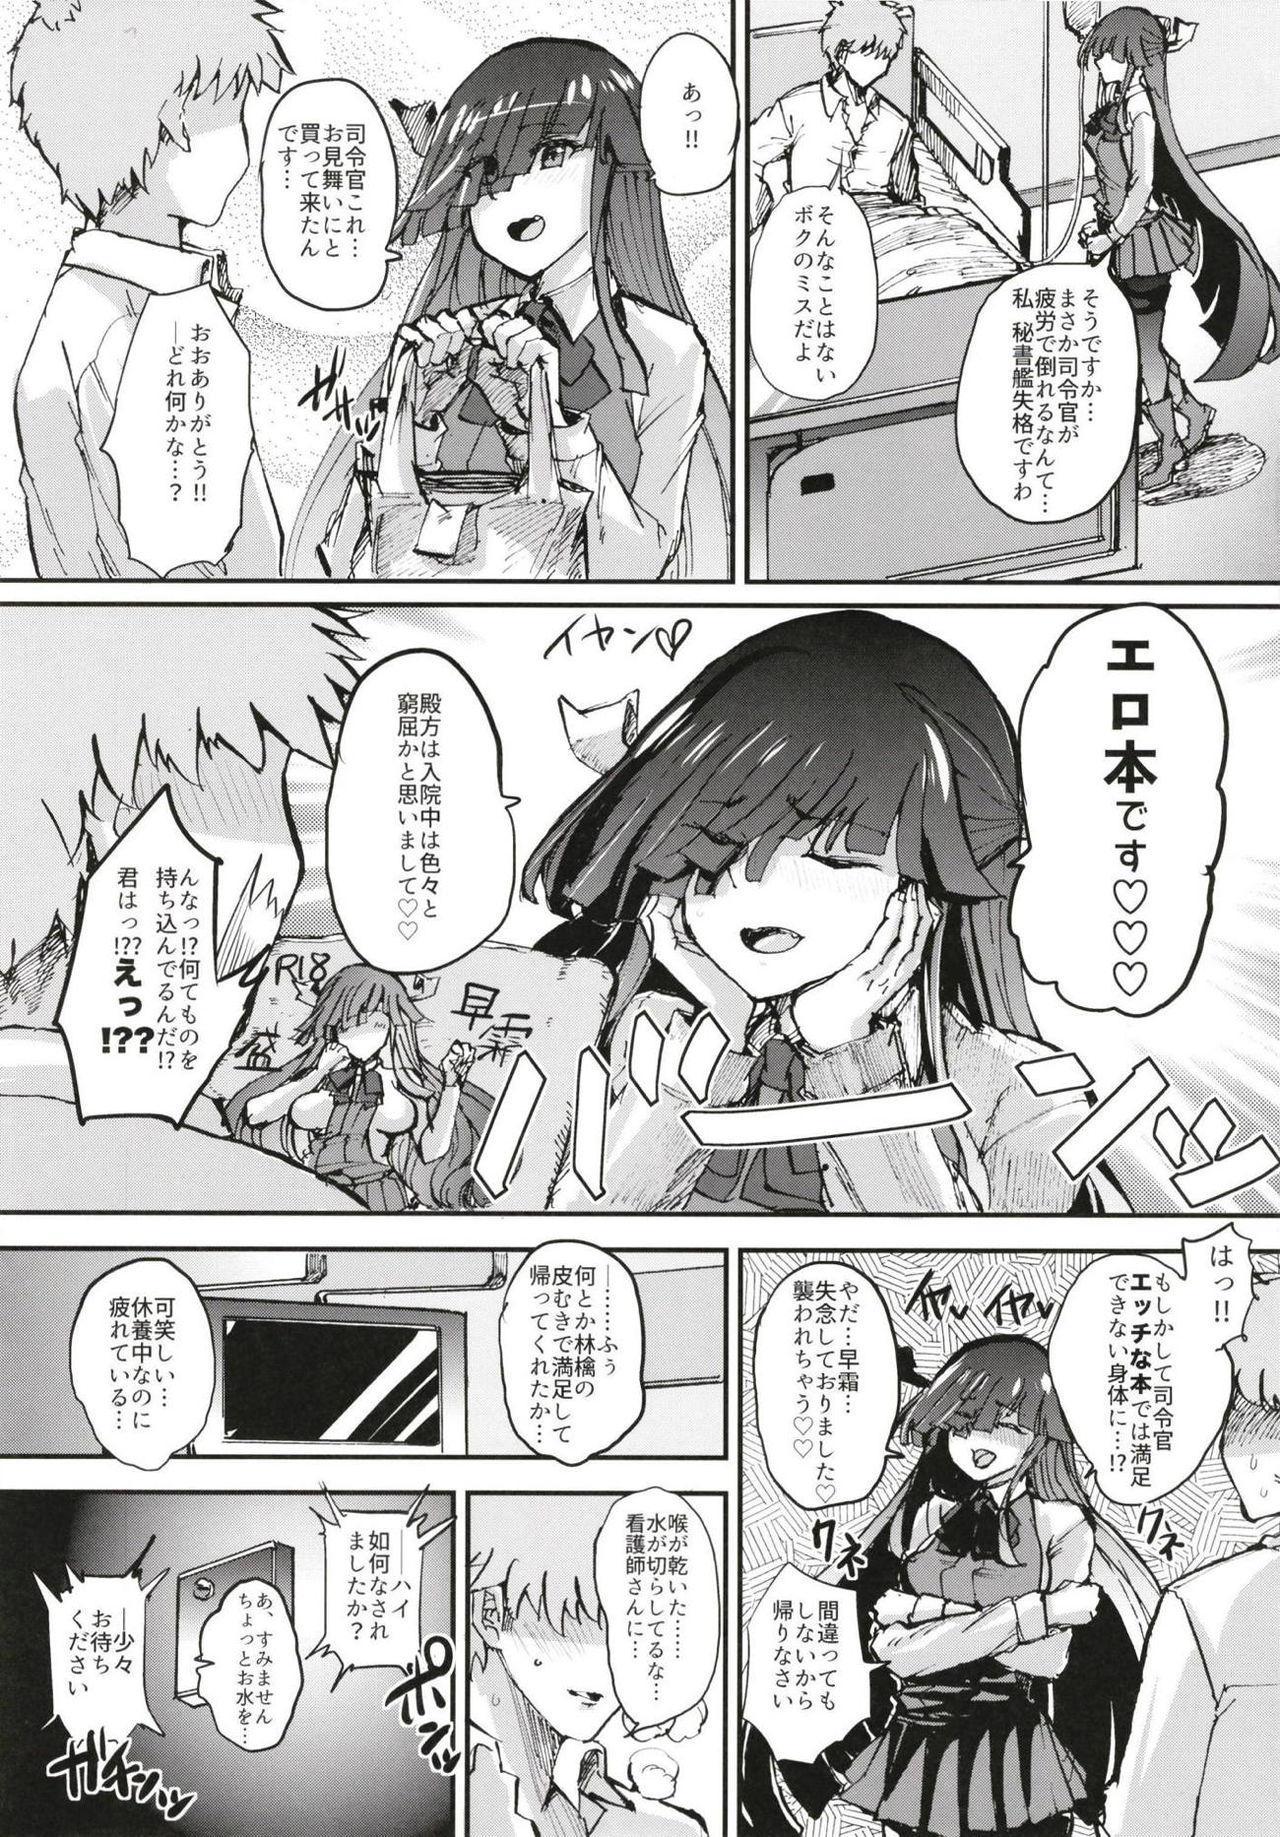 Hayashimo Shibari 2 3